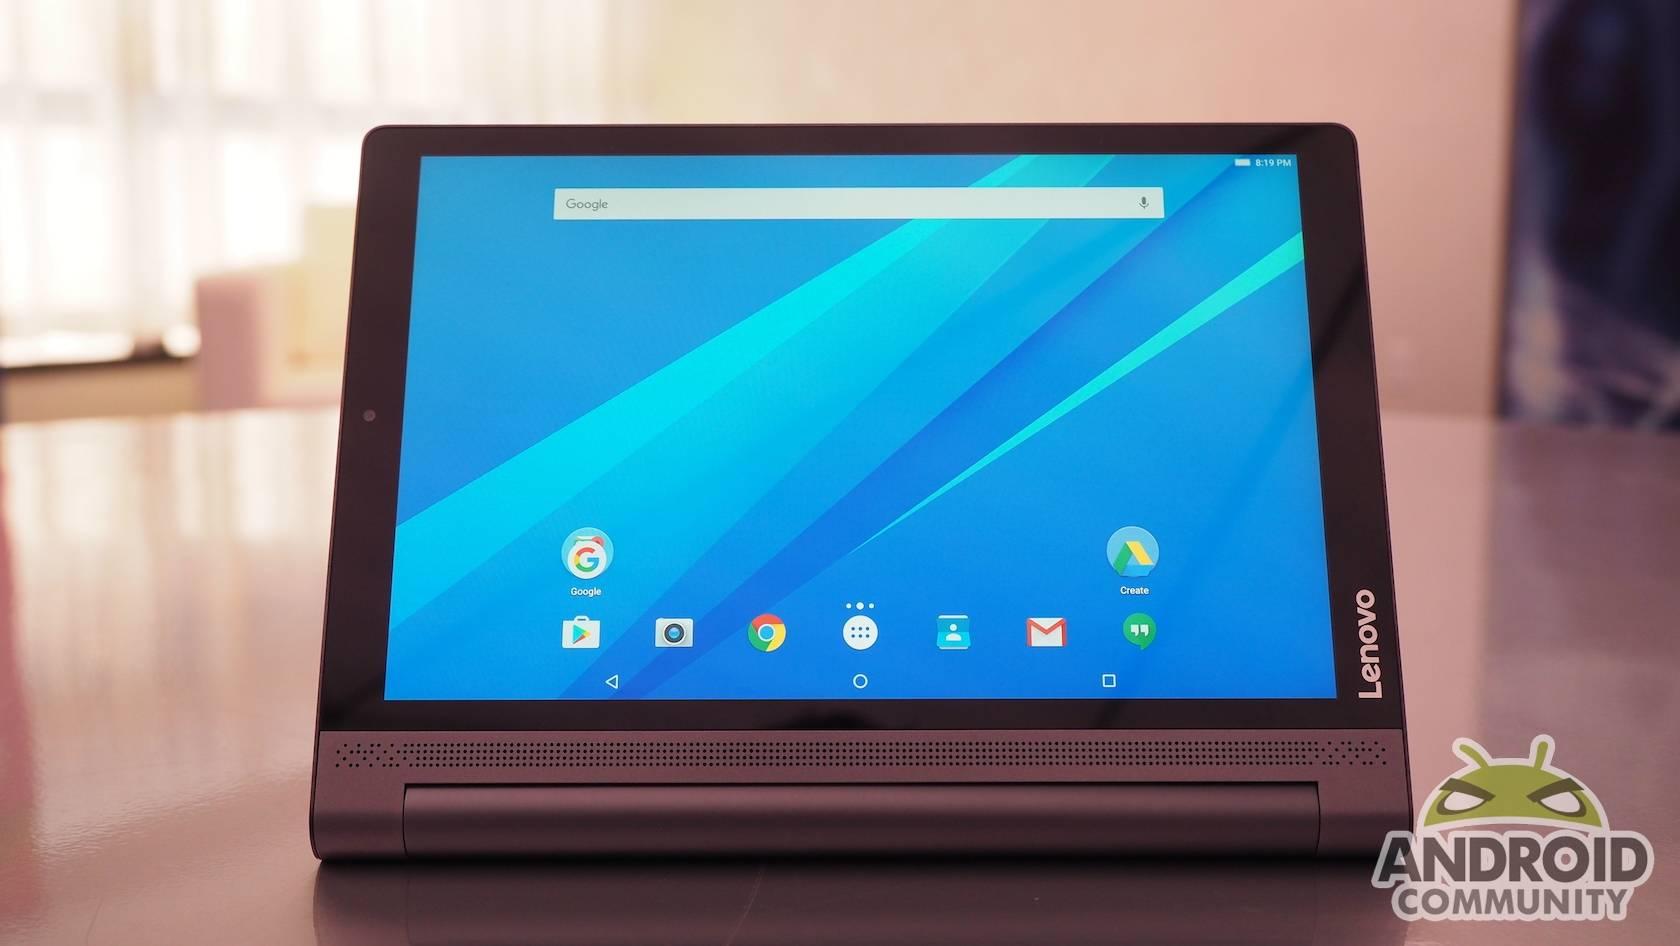 Lenovo Yoga 3 Plus hands-on: hanging around multimedia